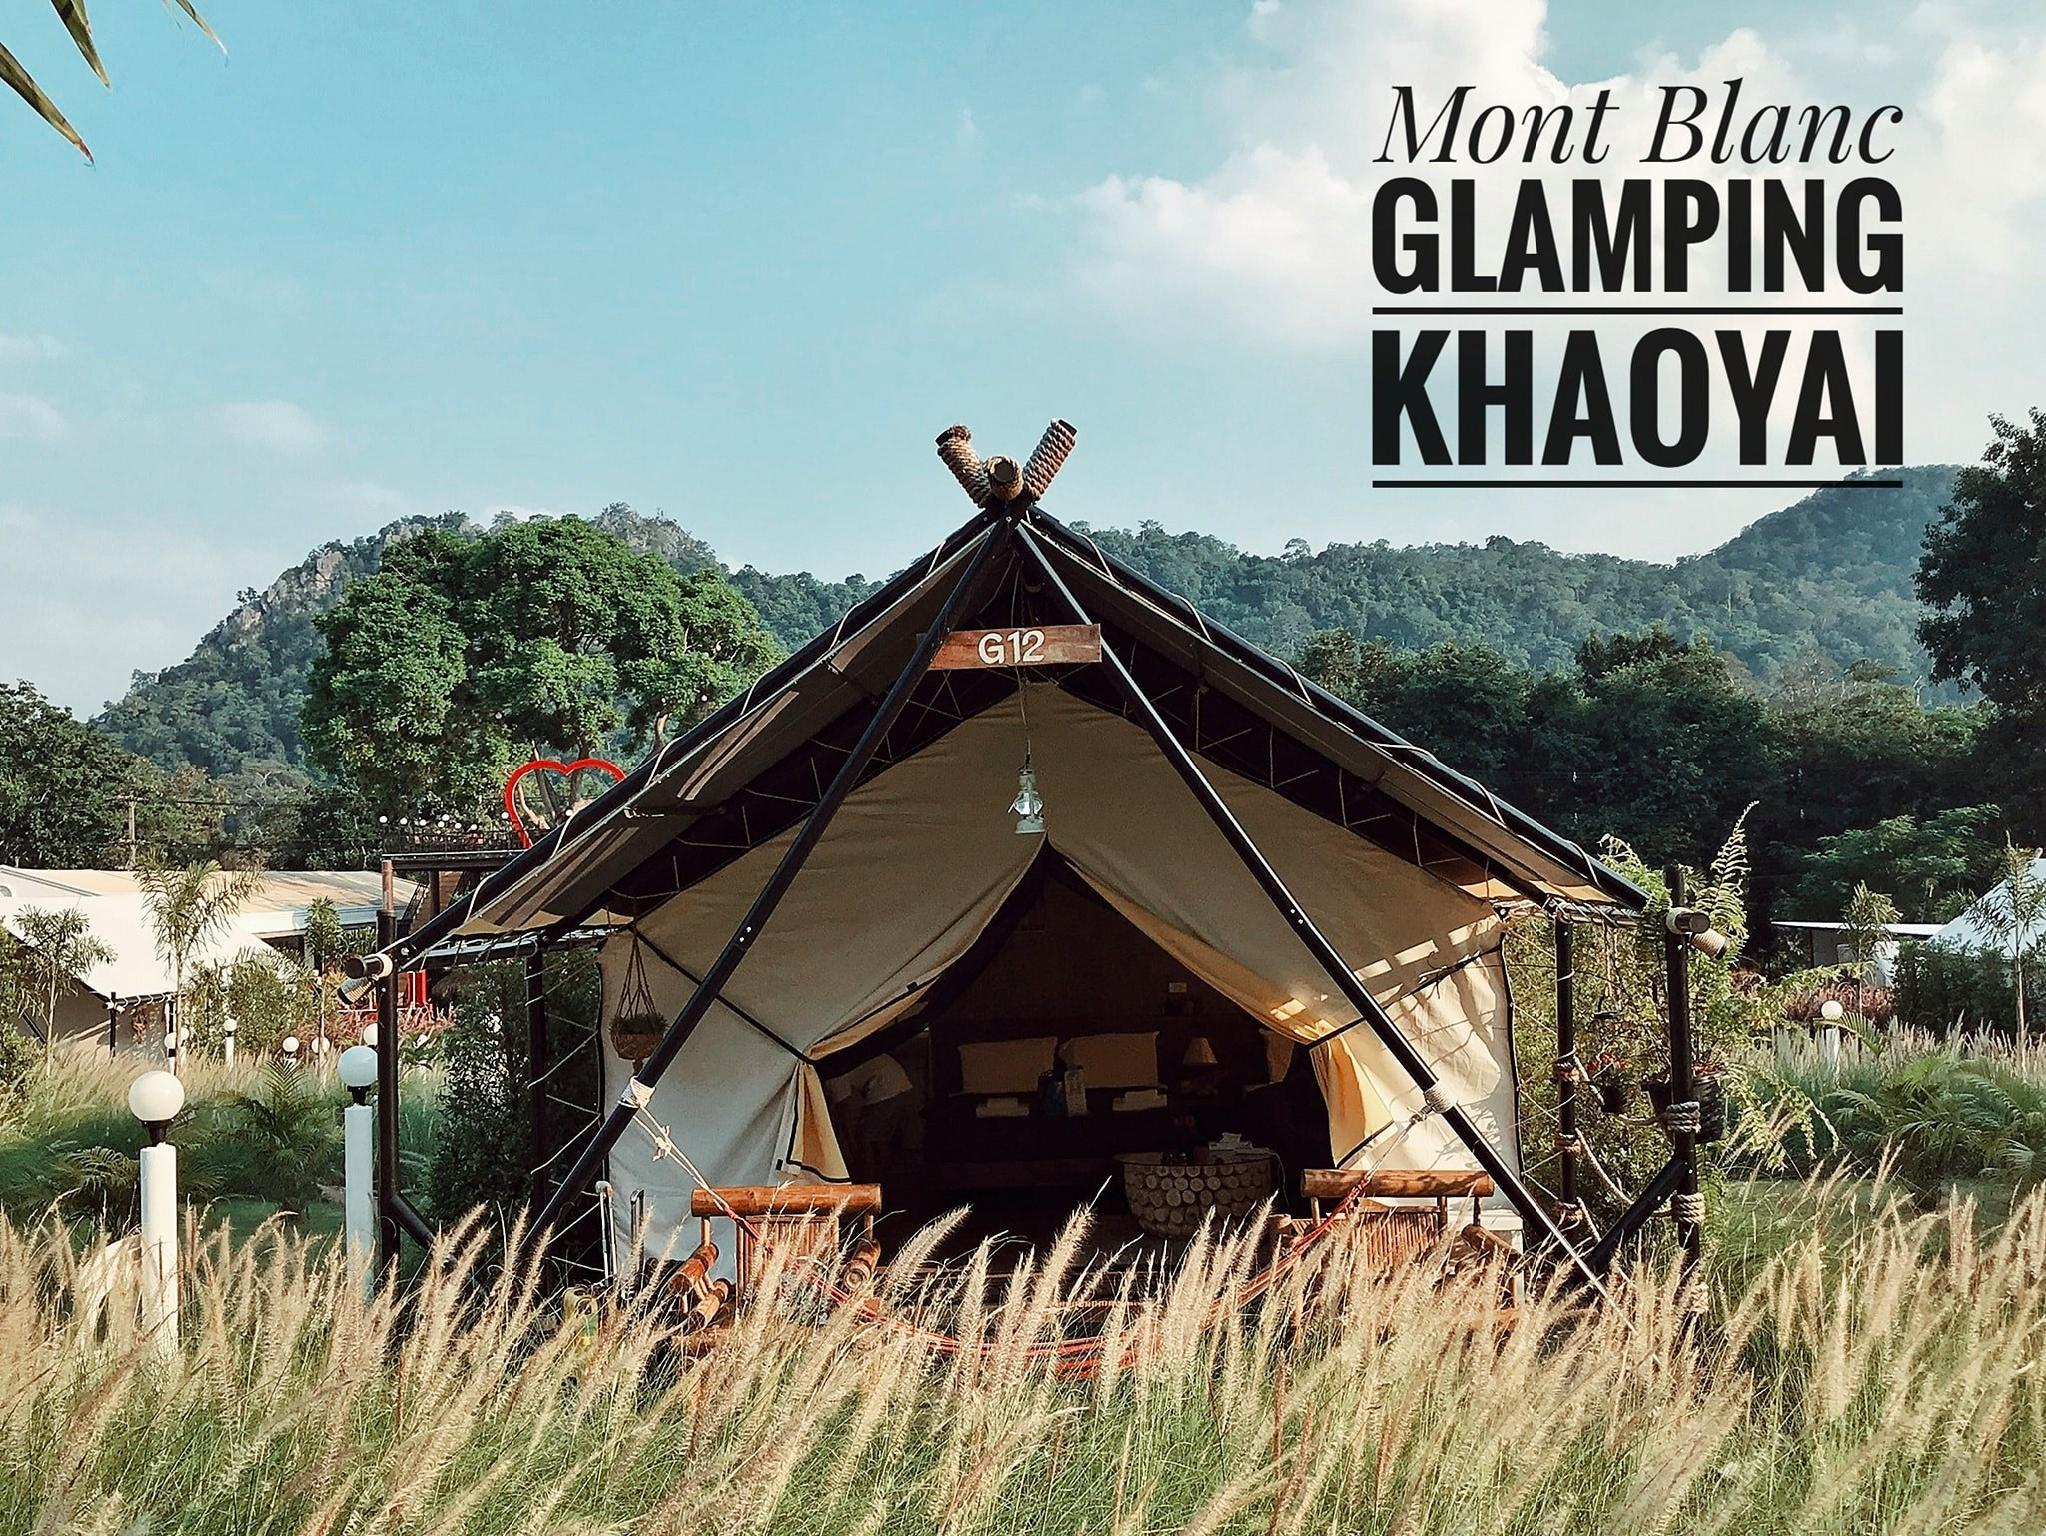 Mont Blanc Glamping Khao Yai   Khao Yai 2020 UPDATED DEALS